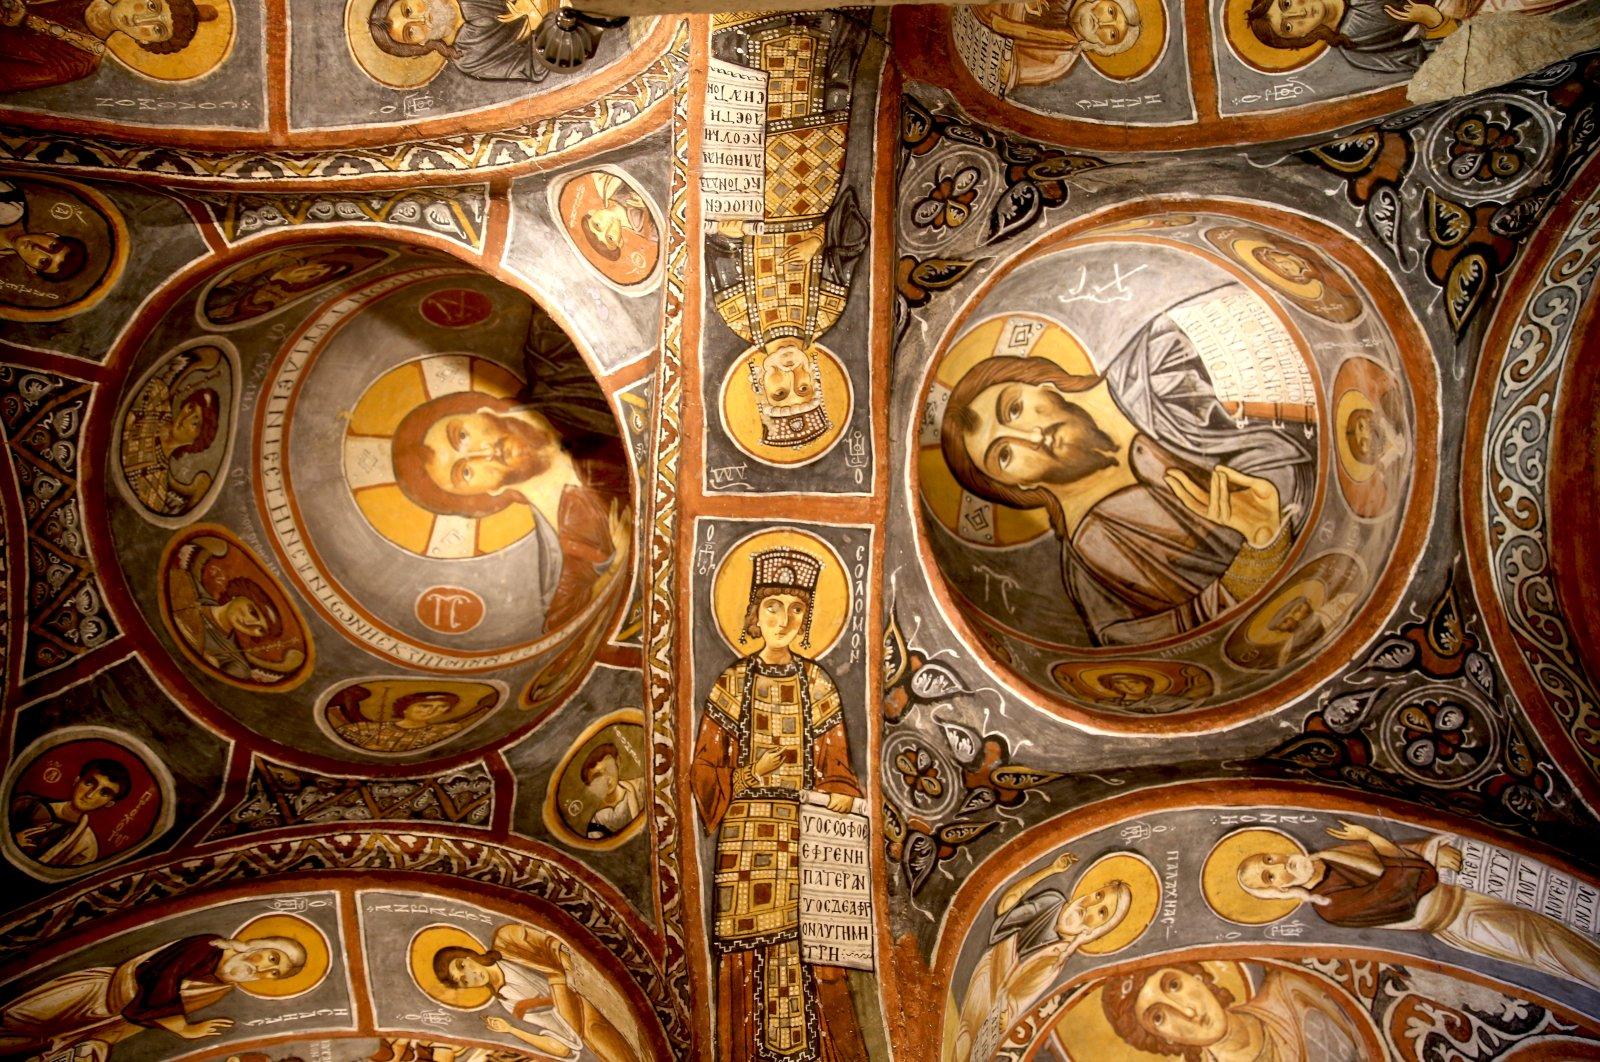 Frescoes depicting Jesus at the church, Cappadocia, central Turkey, Aug. 3, 2020. (AA PHOTO)